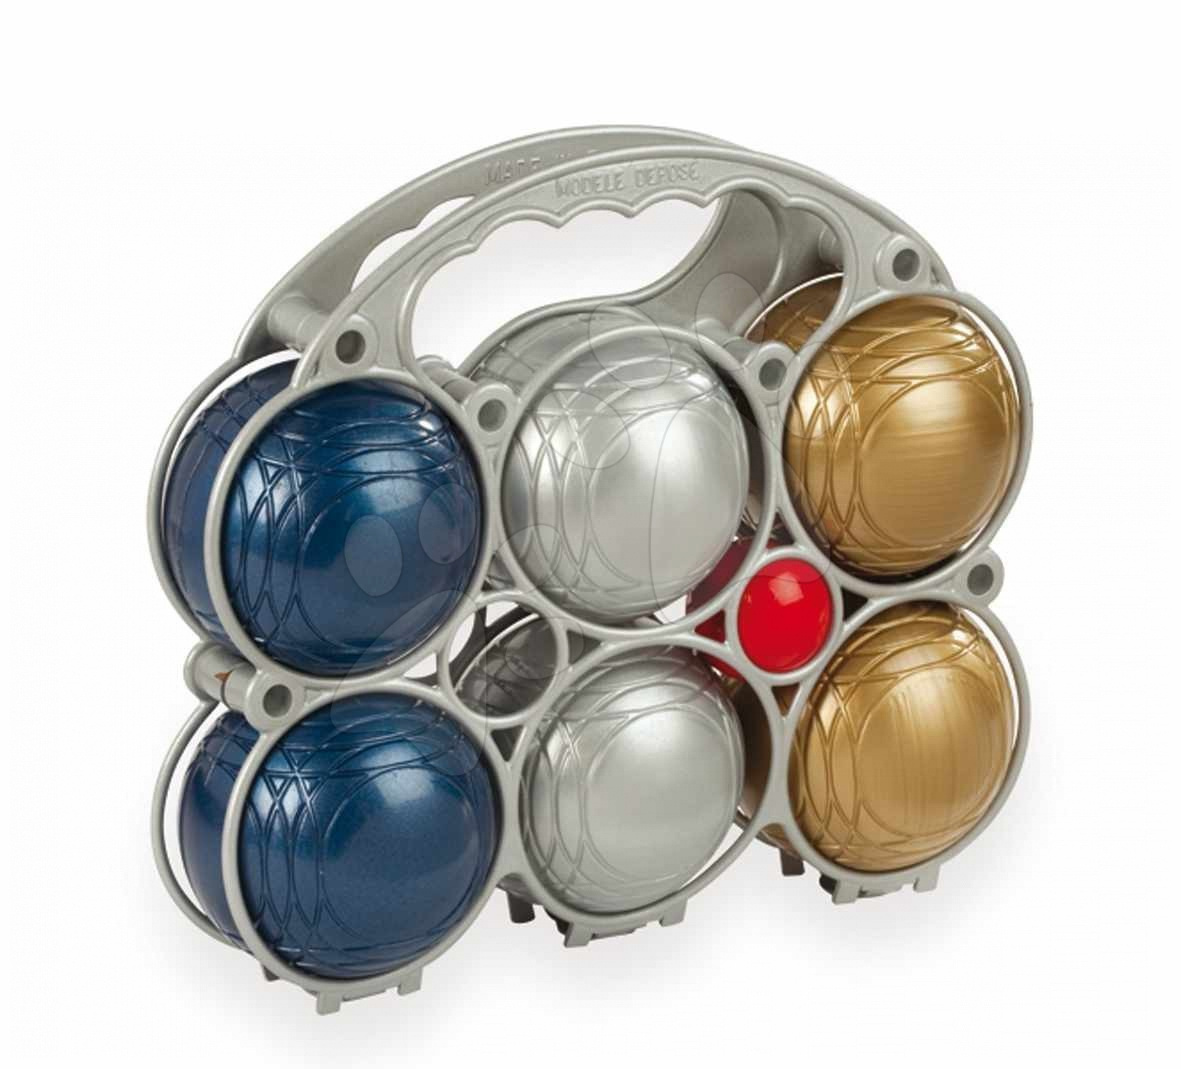 Stari vnosi - Smoby 040039 Petanca metallic (x6), 22,5*7*20 cm